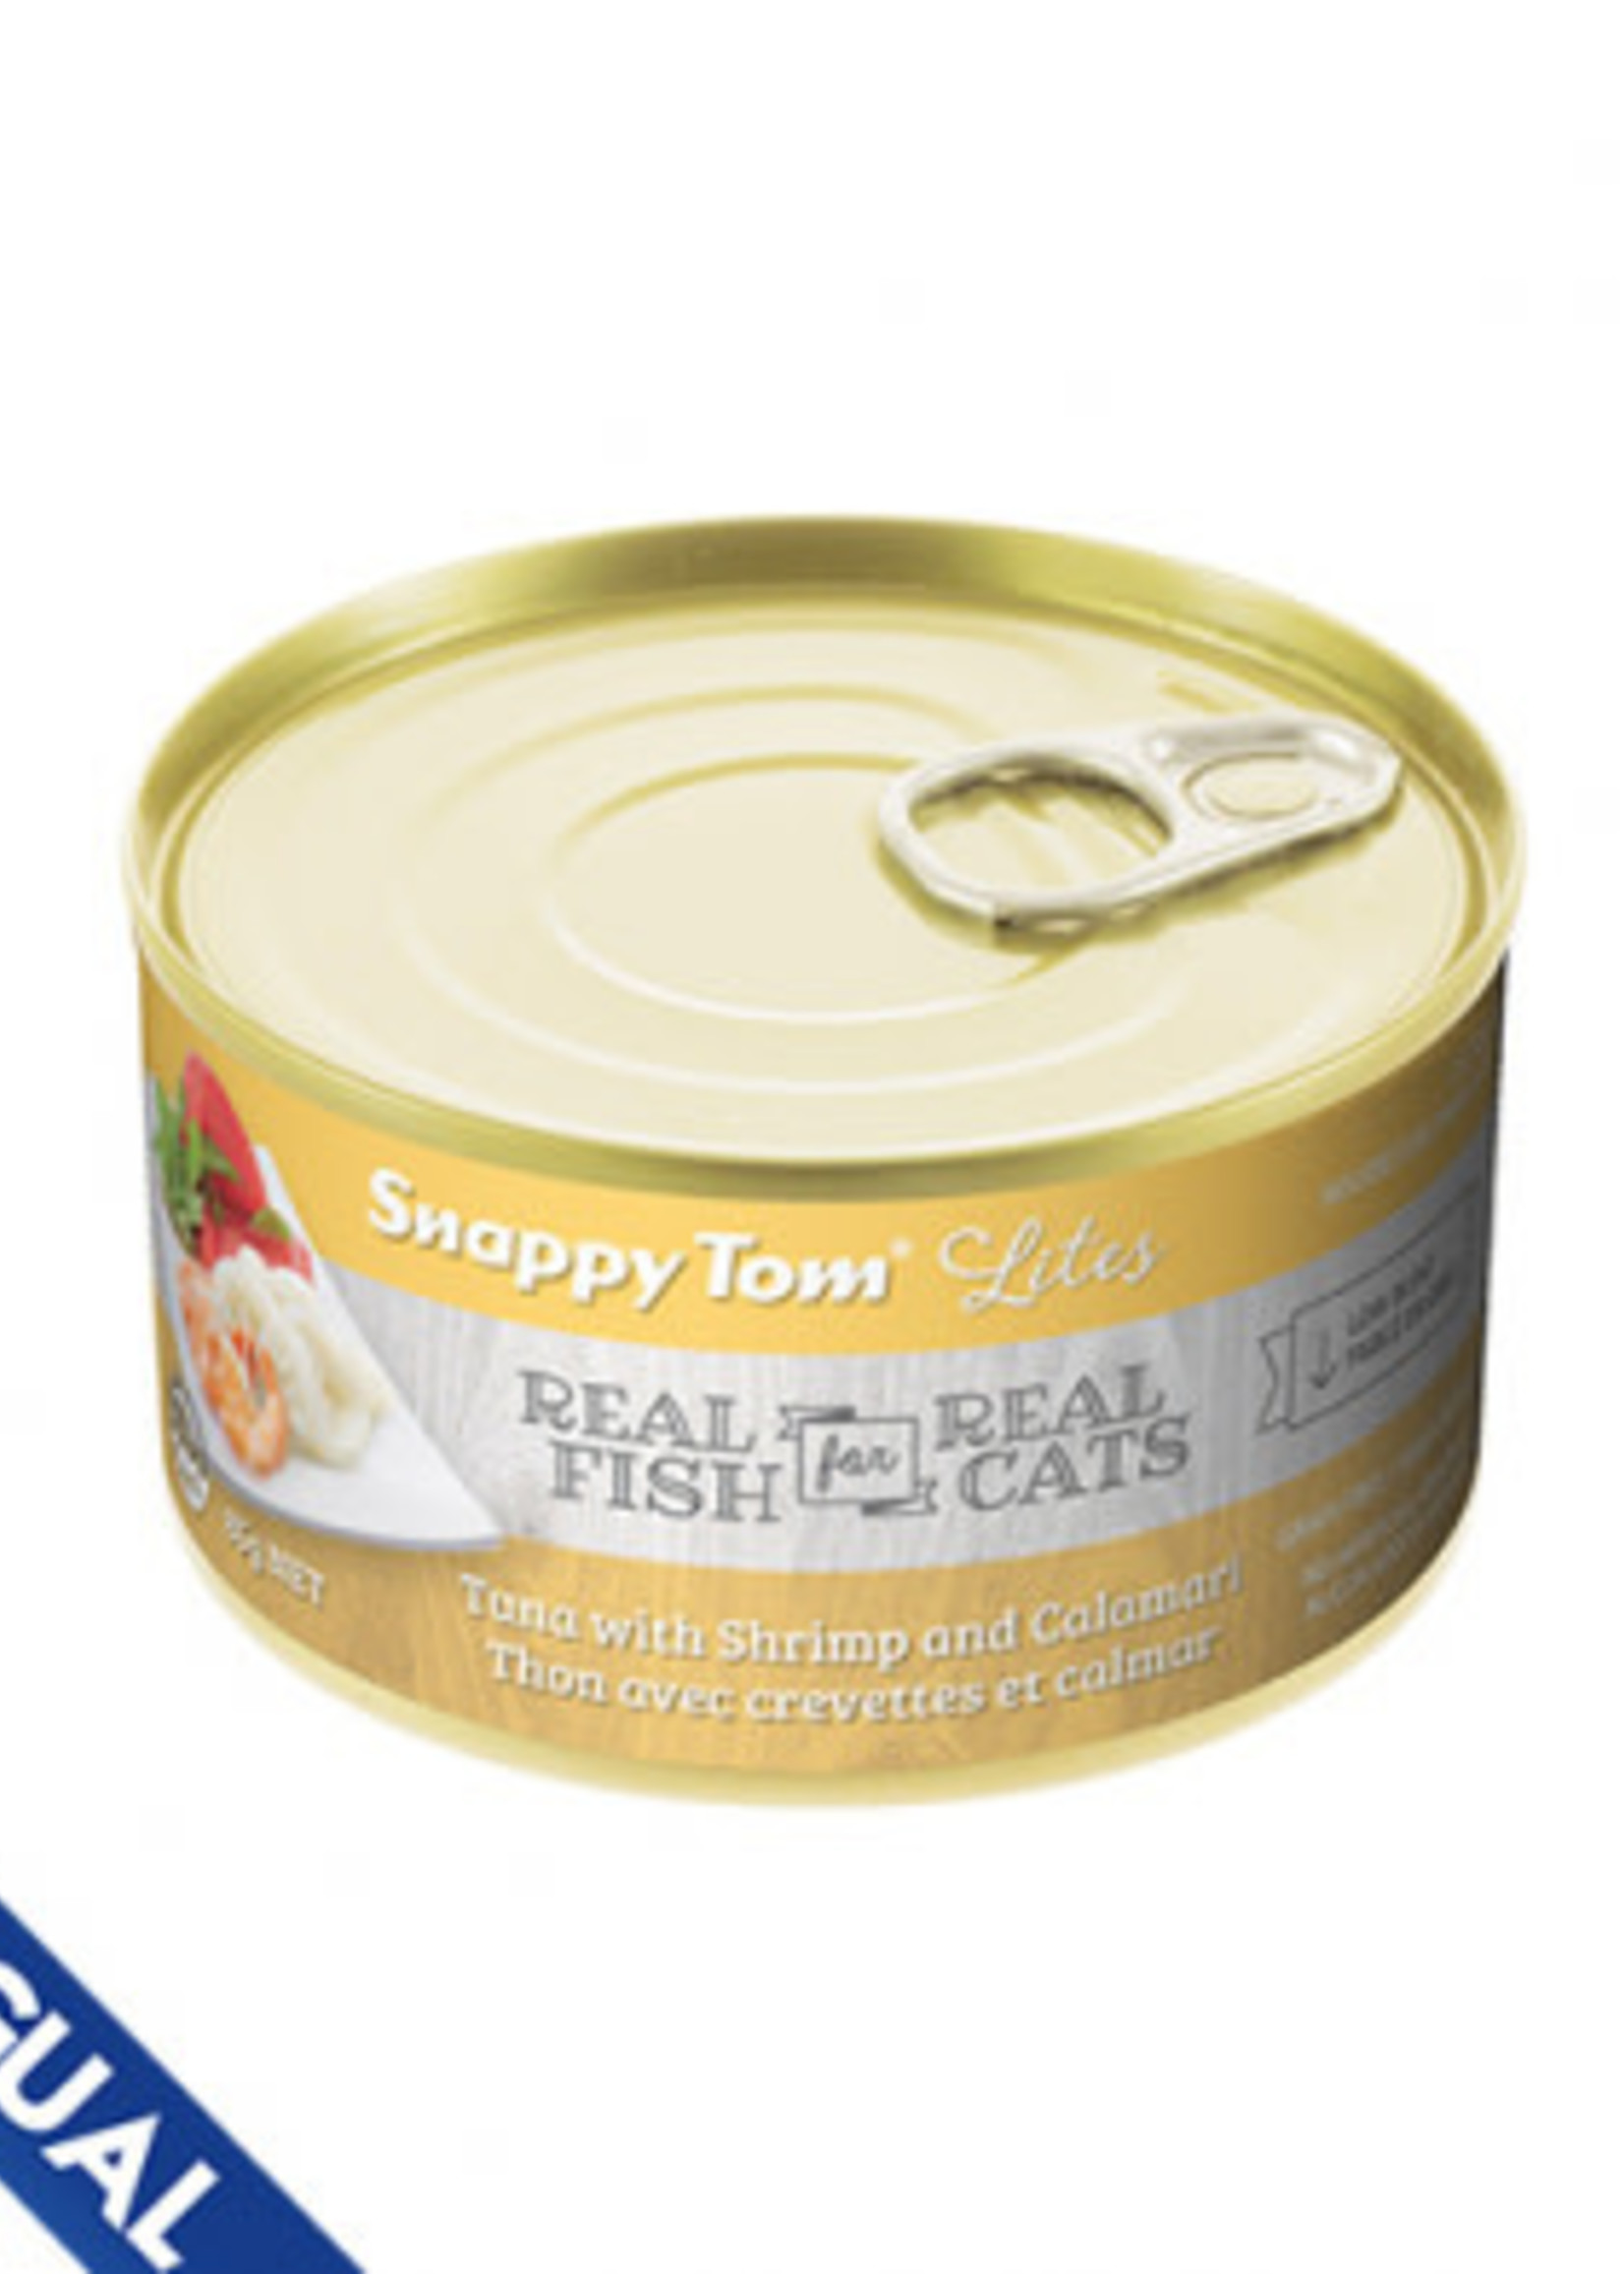 Snappy Tom Snappy Tom Lites Tuna with Shrimp and Calamari 5.5oz